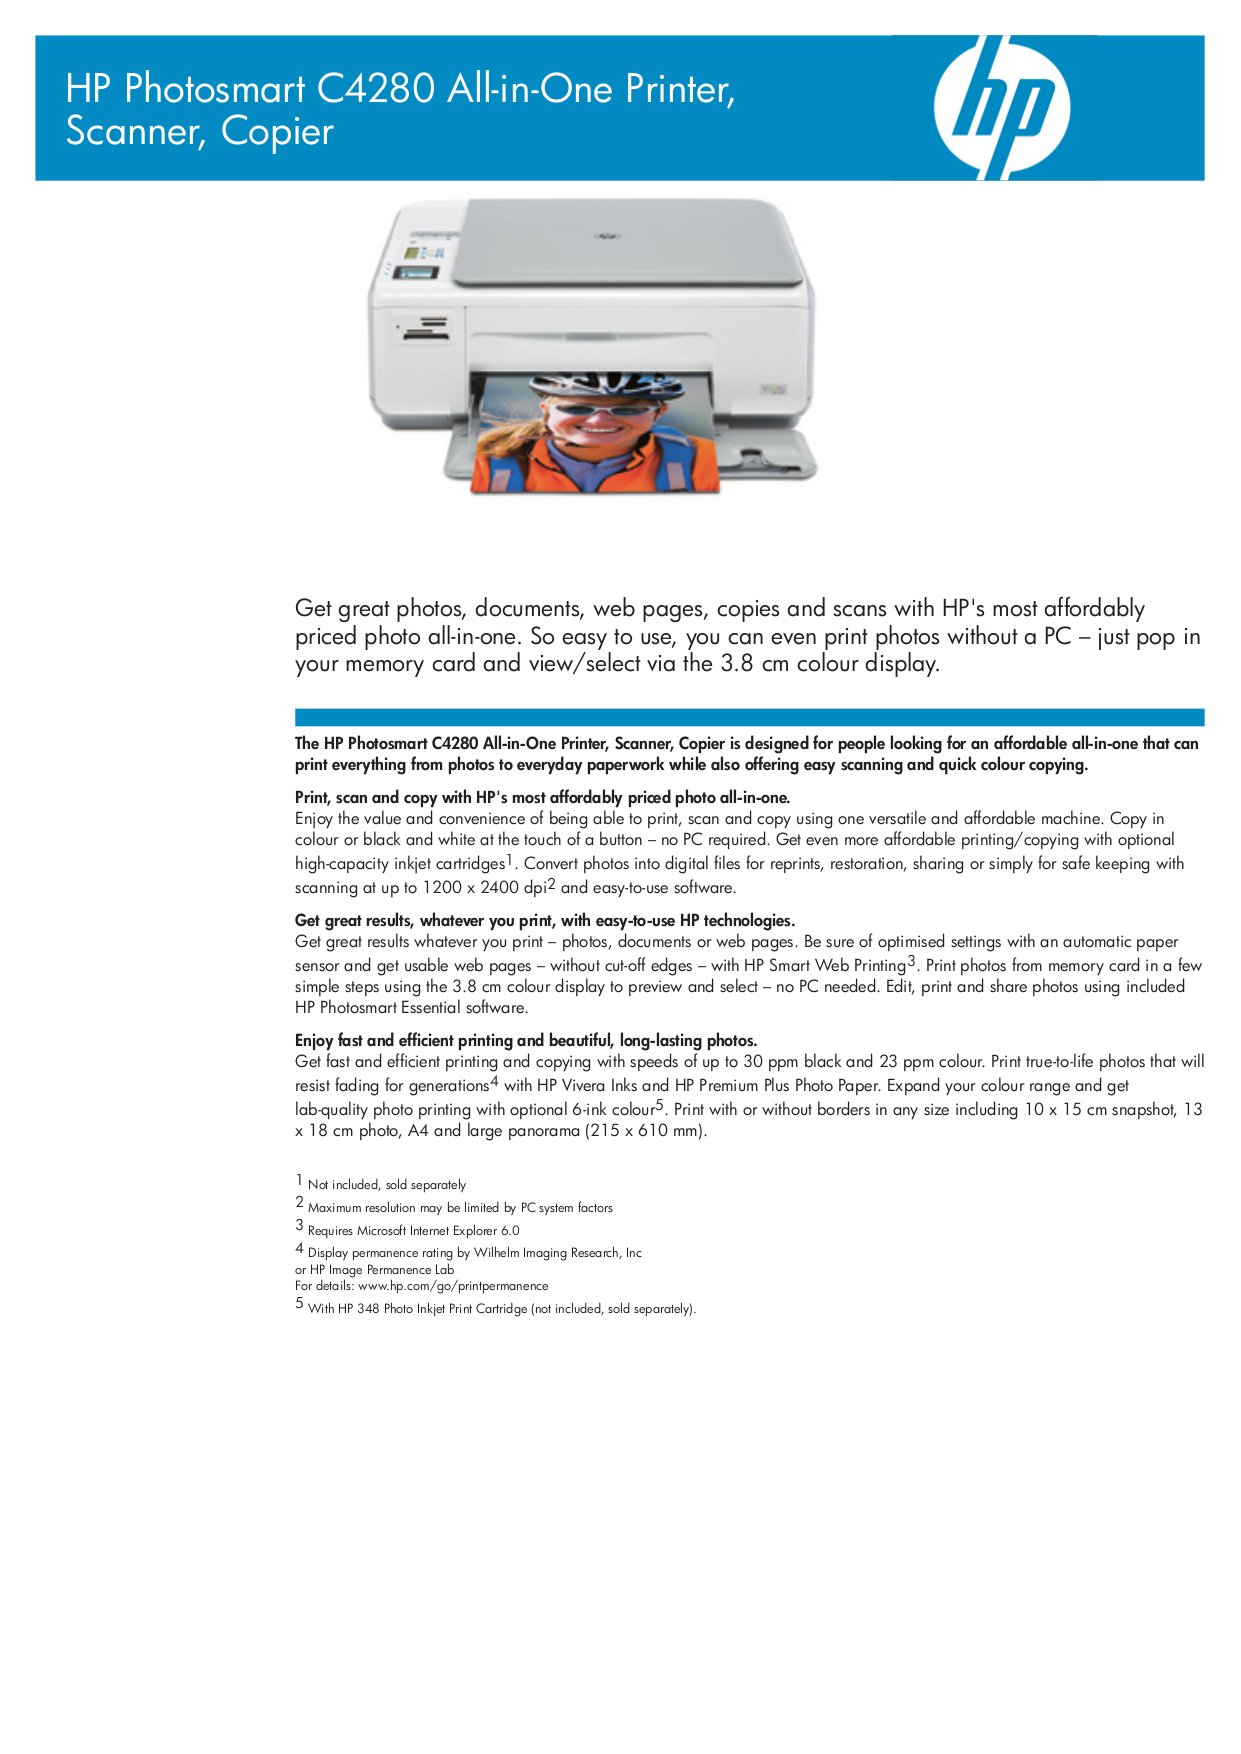 Hp C4280 Manual Block Diagram Hpbusinessinkjet3000dtn Array Download Free Pdf For Photosmart 337 Printer Rh Umlib Com